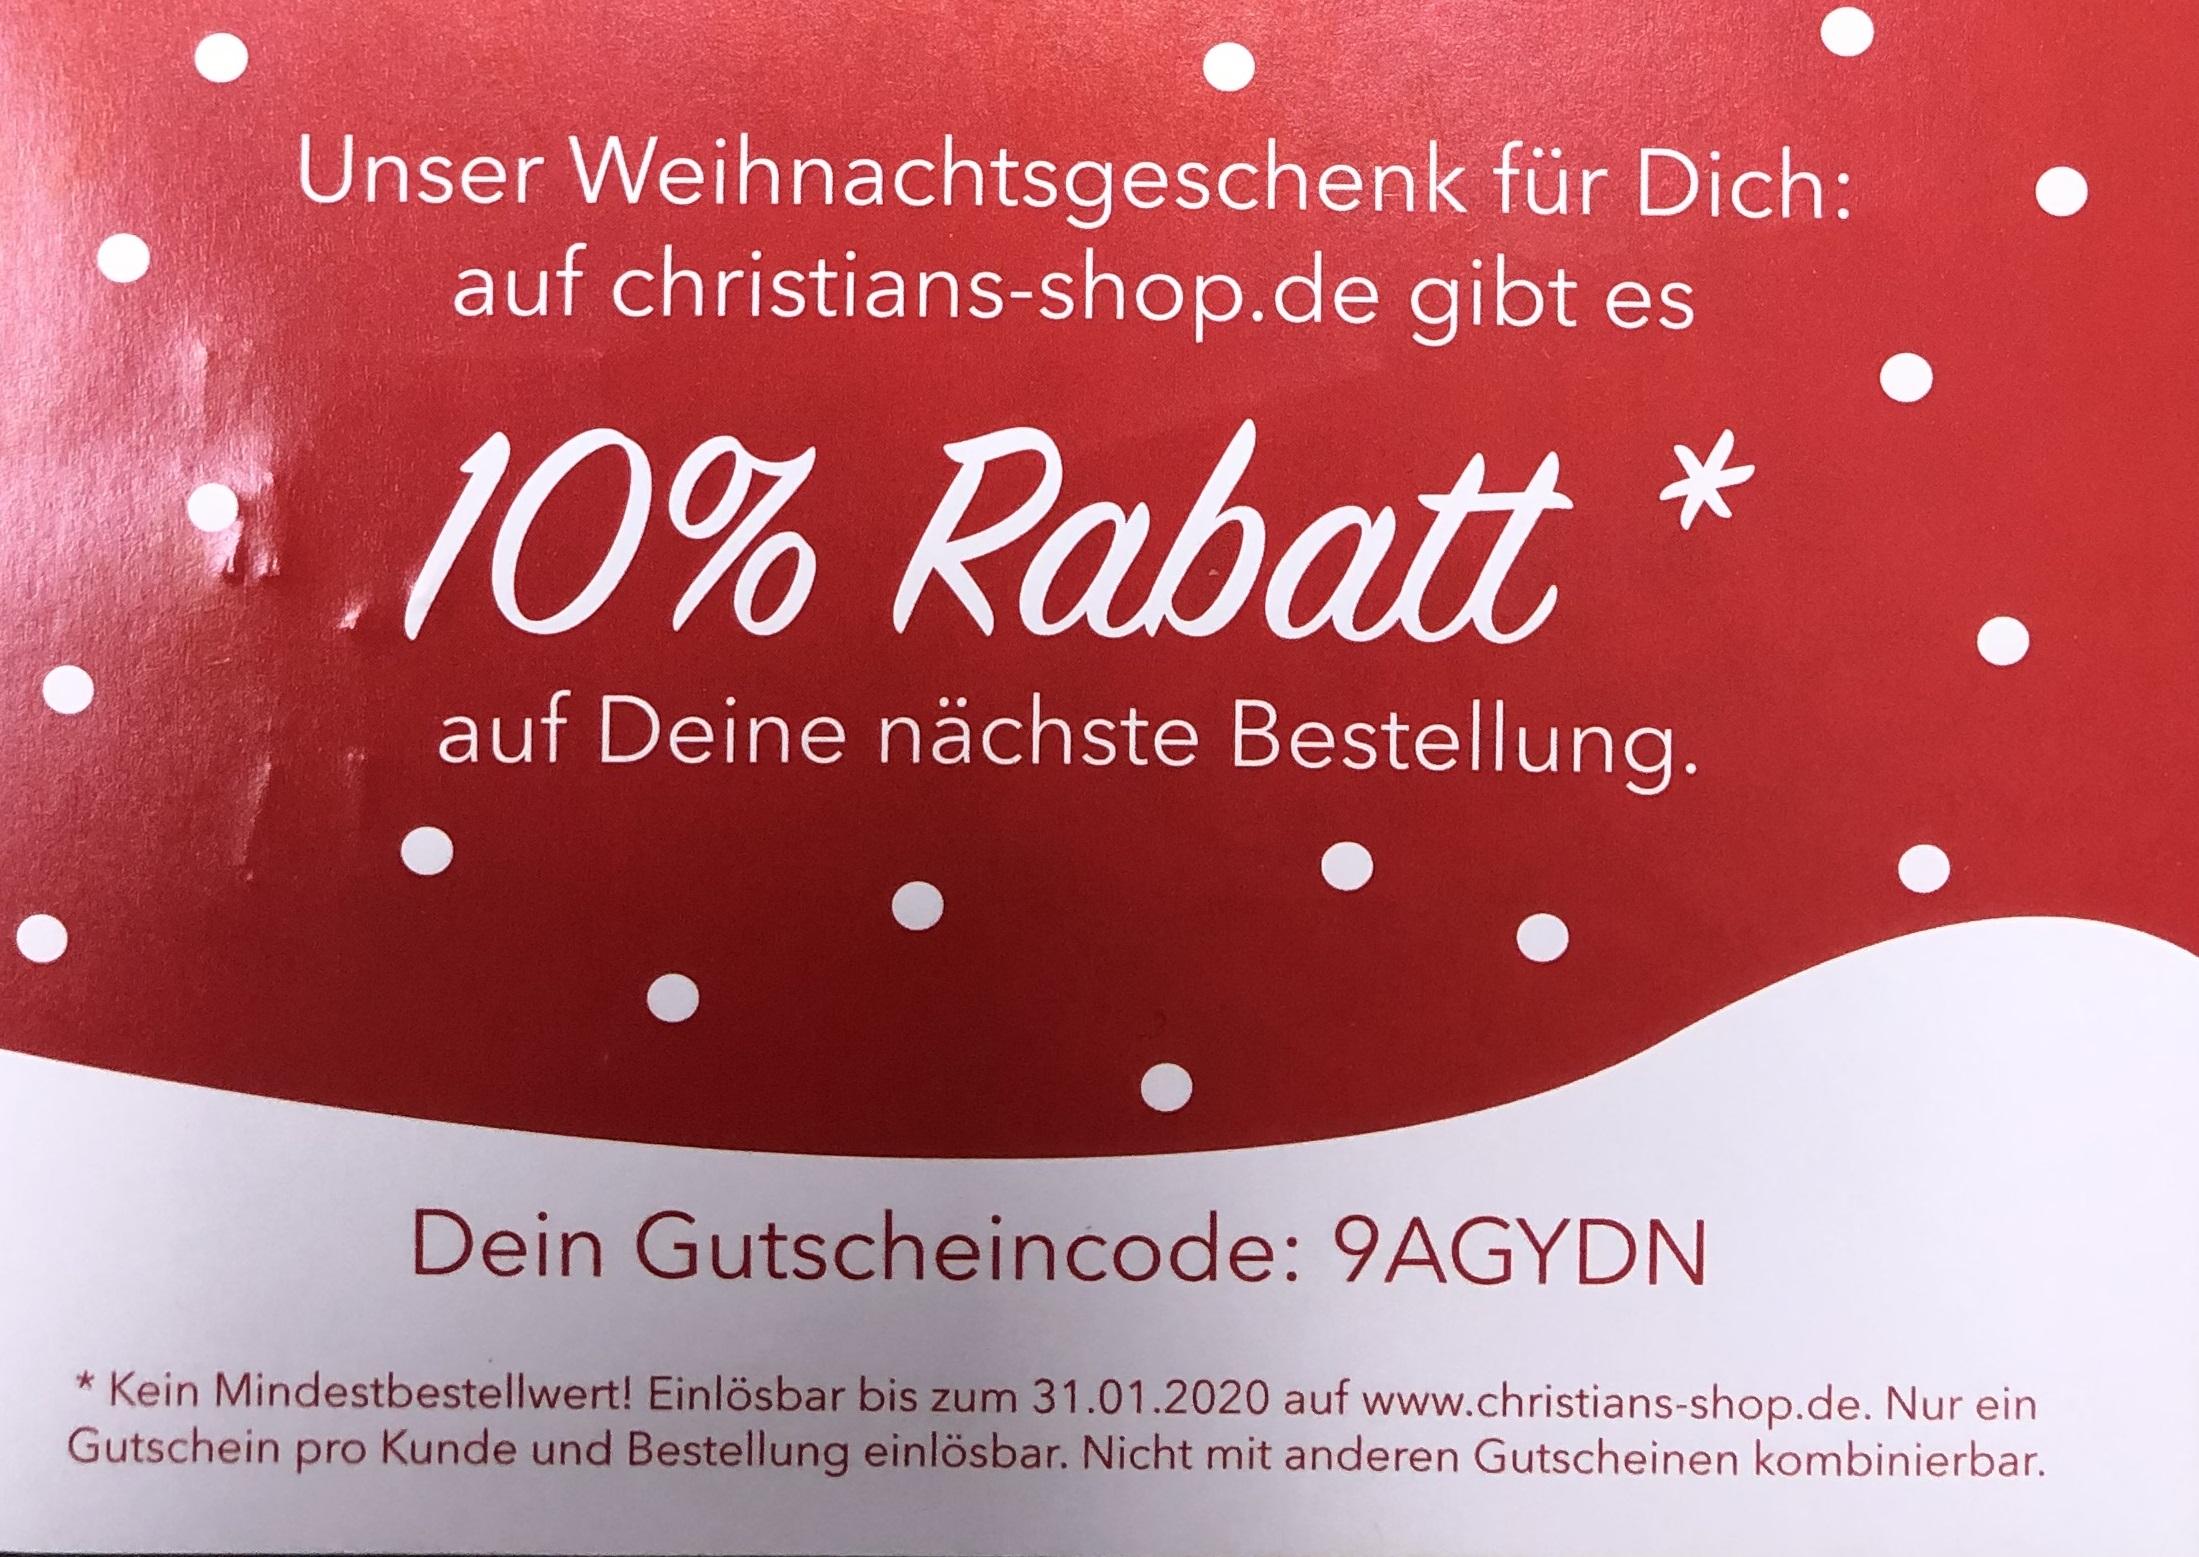 10% Rabatt bei Christians Technikshop ohne MBW